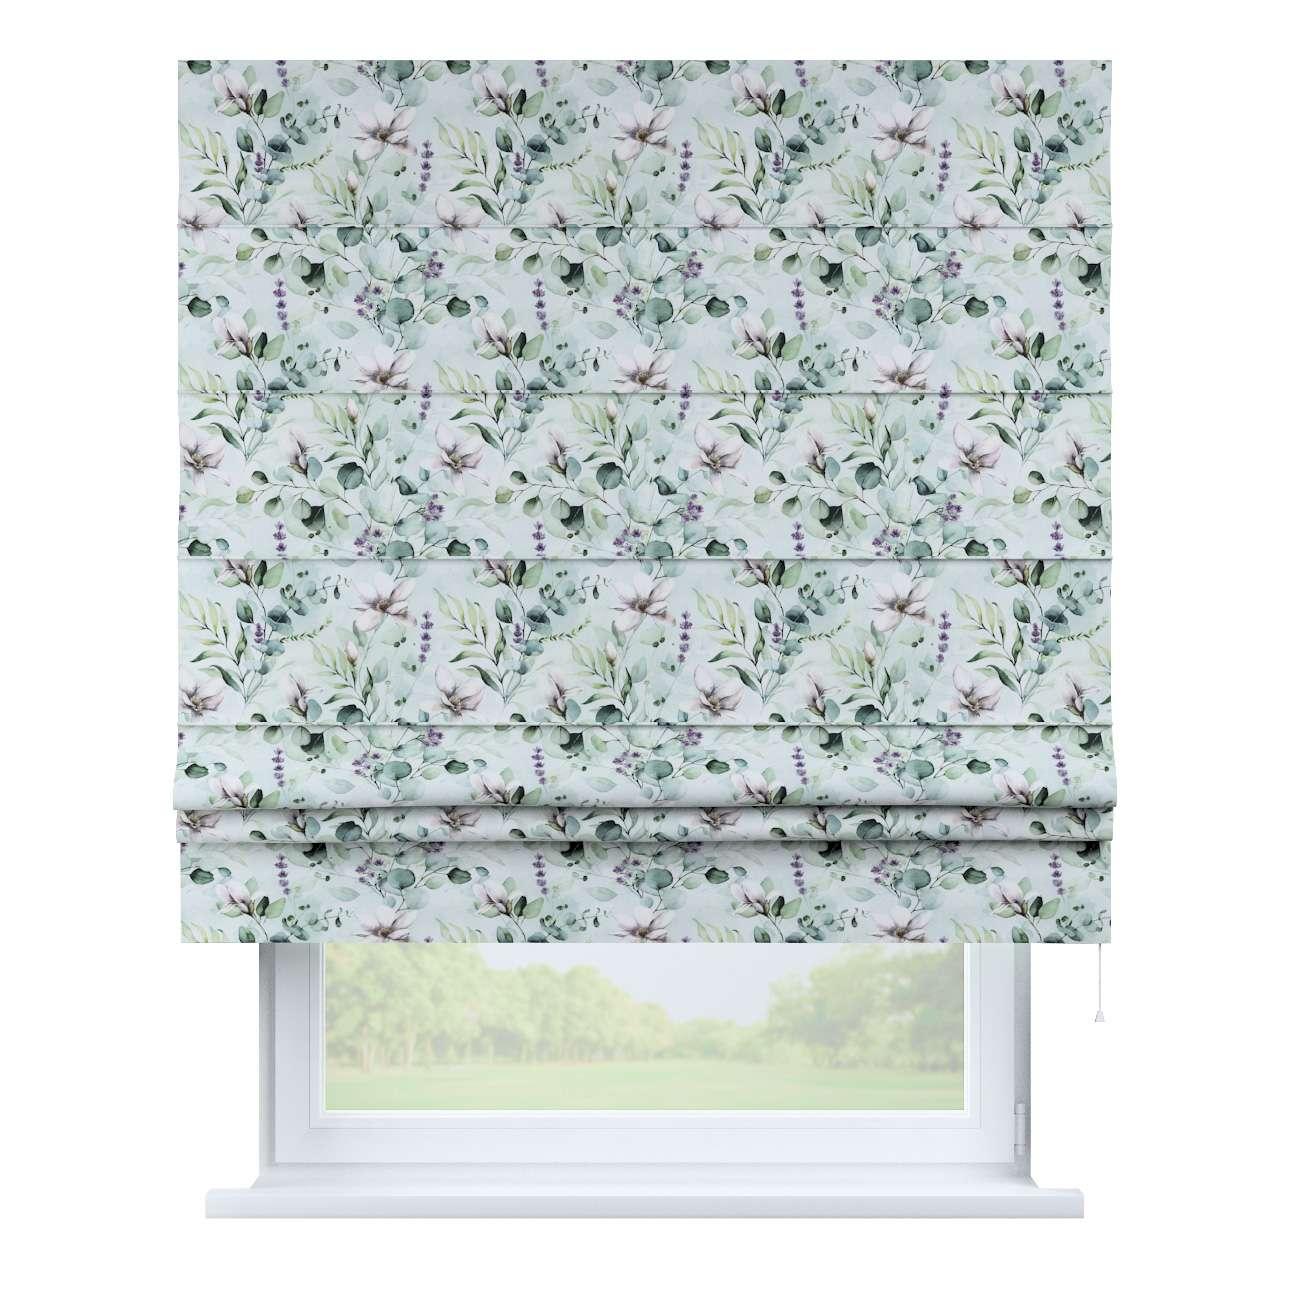 Rímska roleta Padva V kolekcii Flowers, tkanina: 143-66